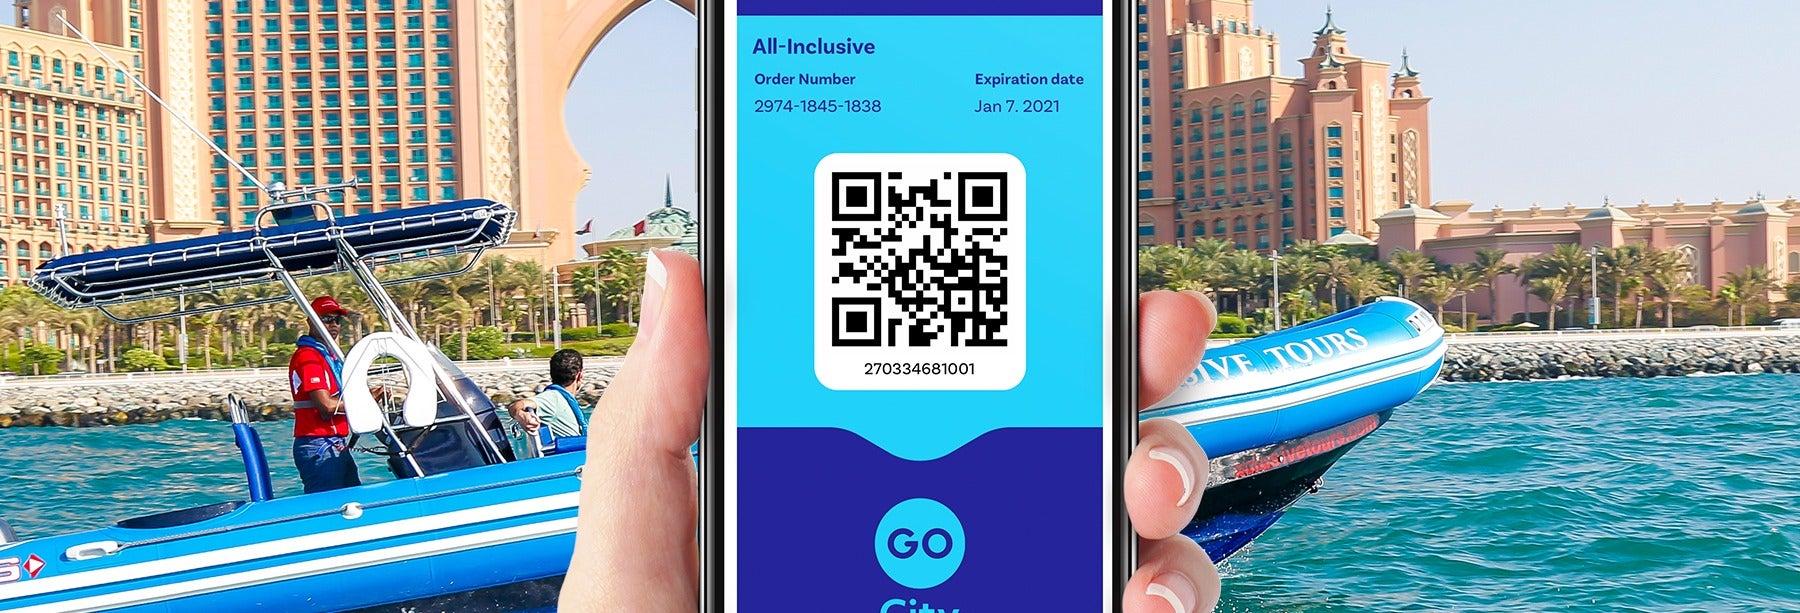 Go Dubai All-Inclusive Pass